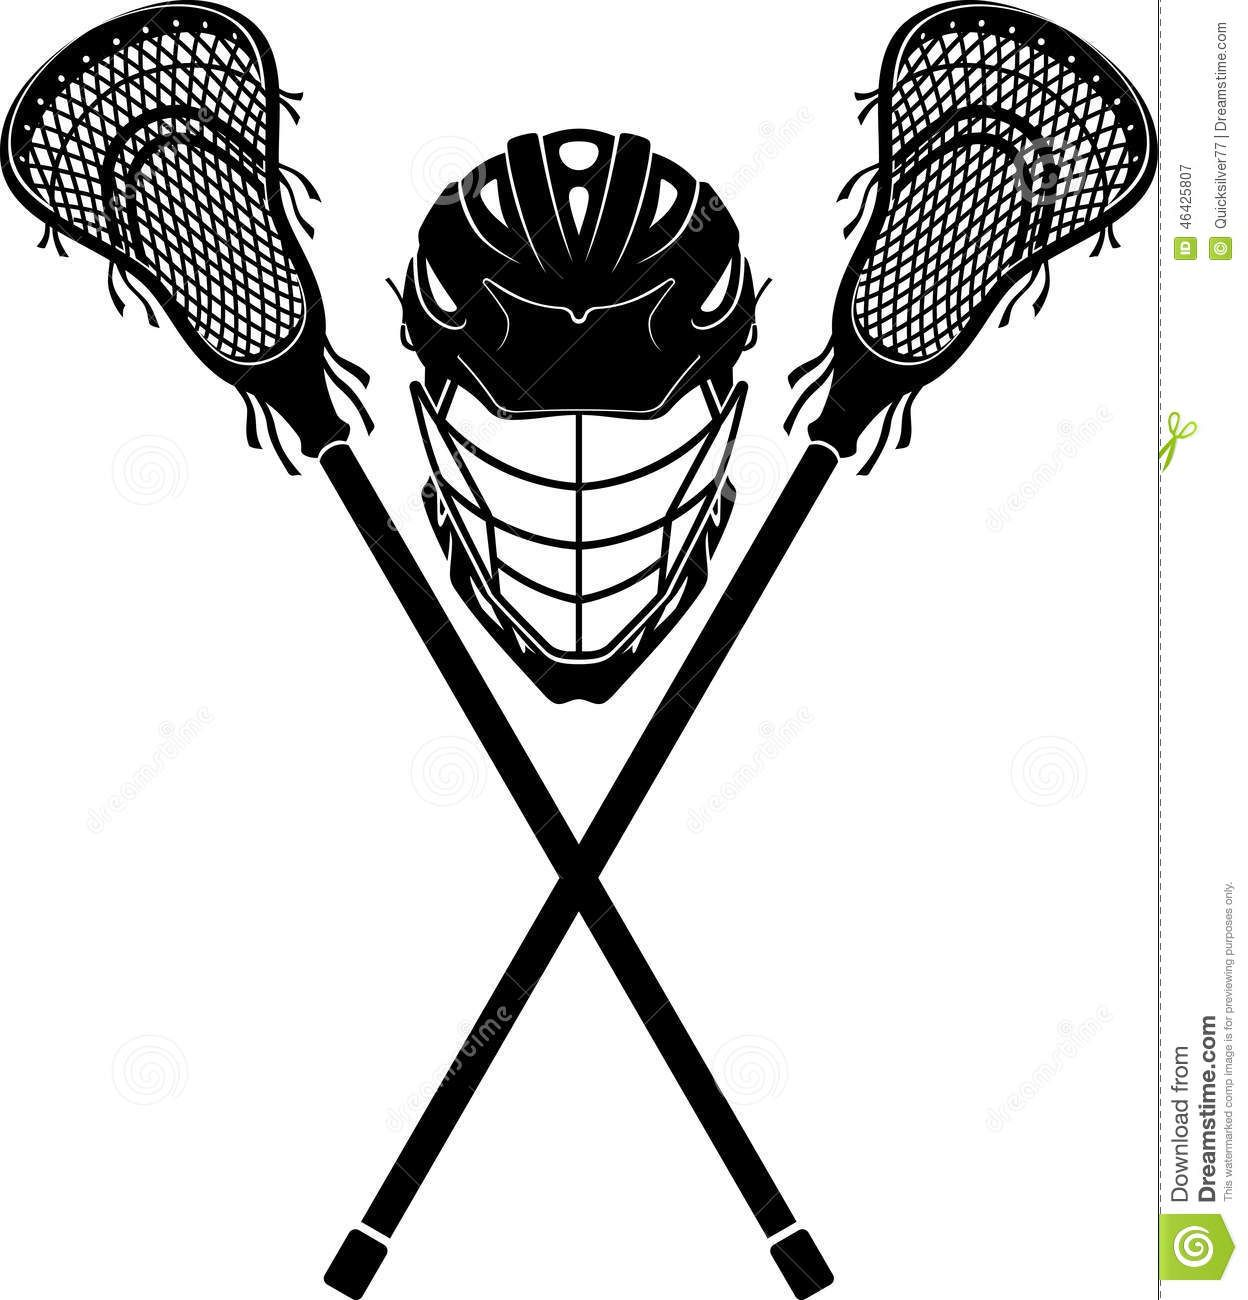 medium resolution of la crosse silhouette clip art silhouette projects lacrosse sport sports equipment